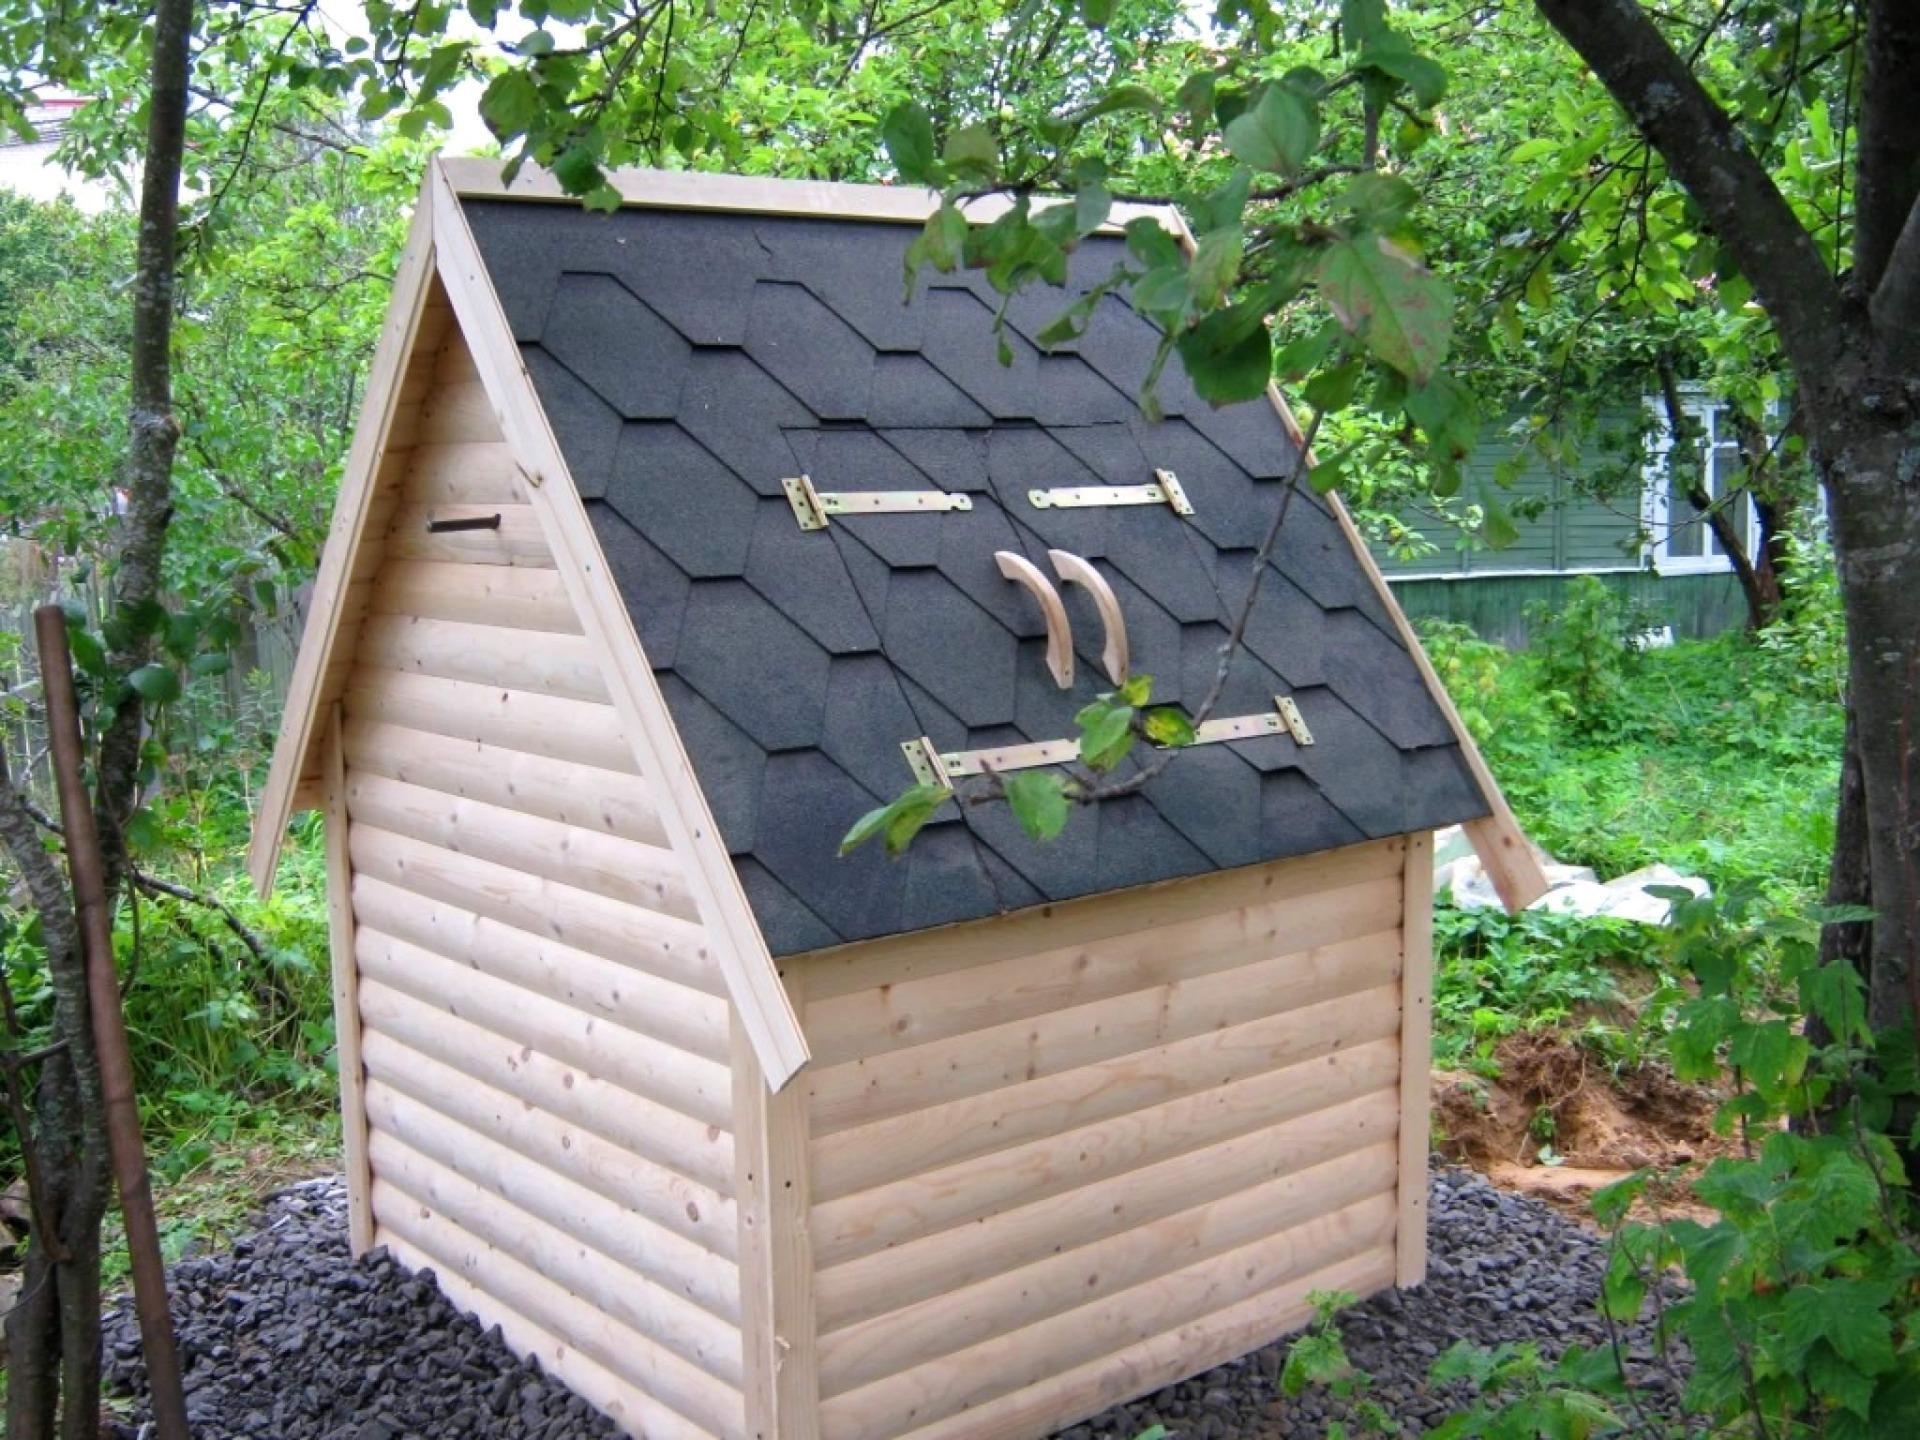 Домик для скважины на даче фото